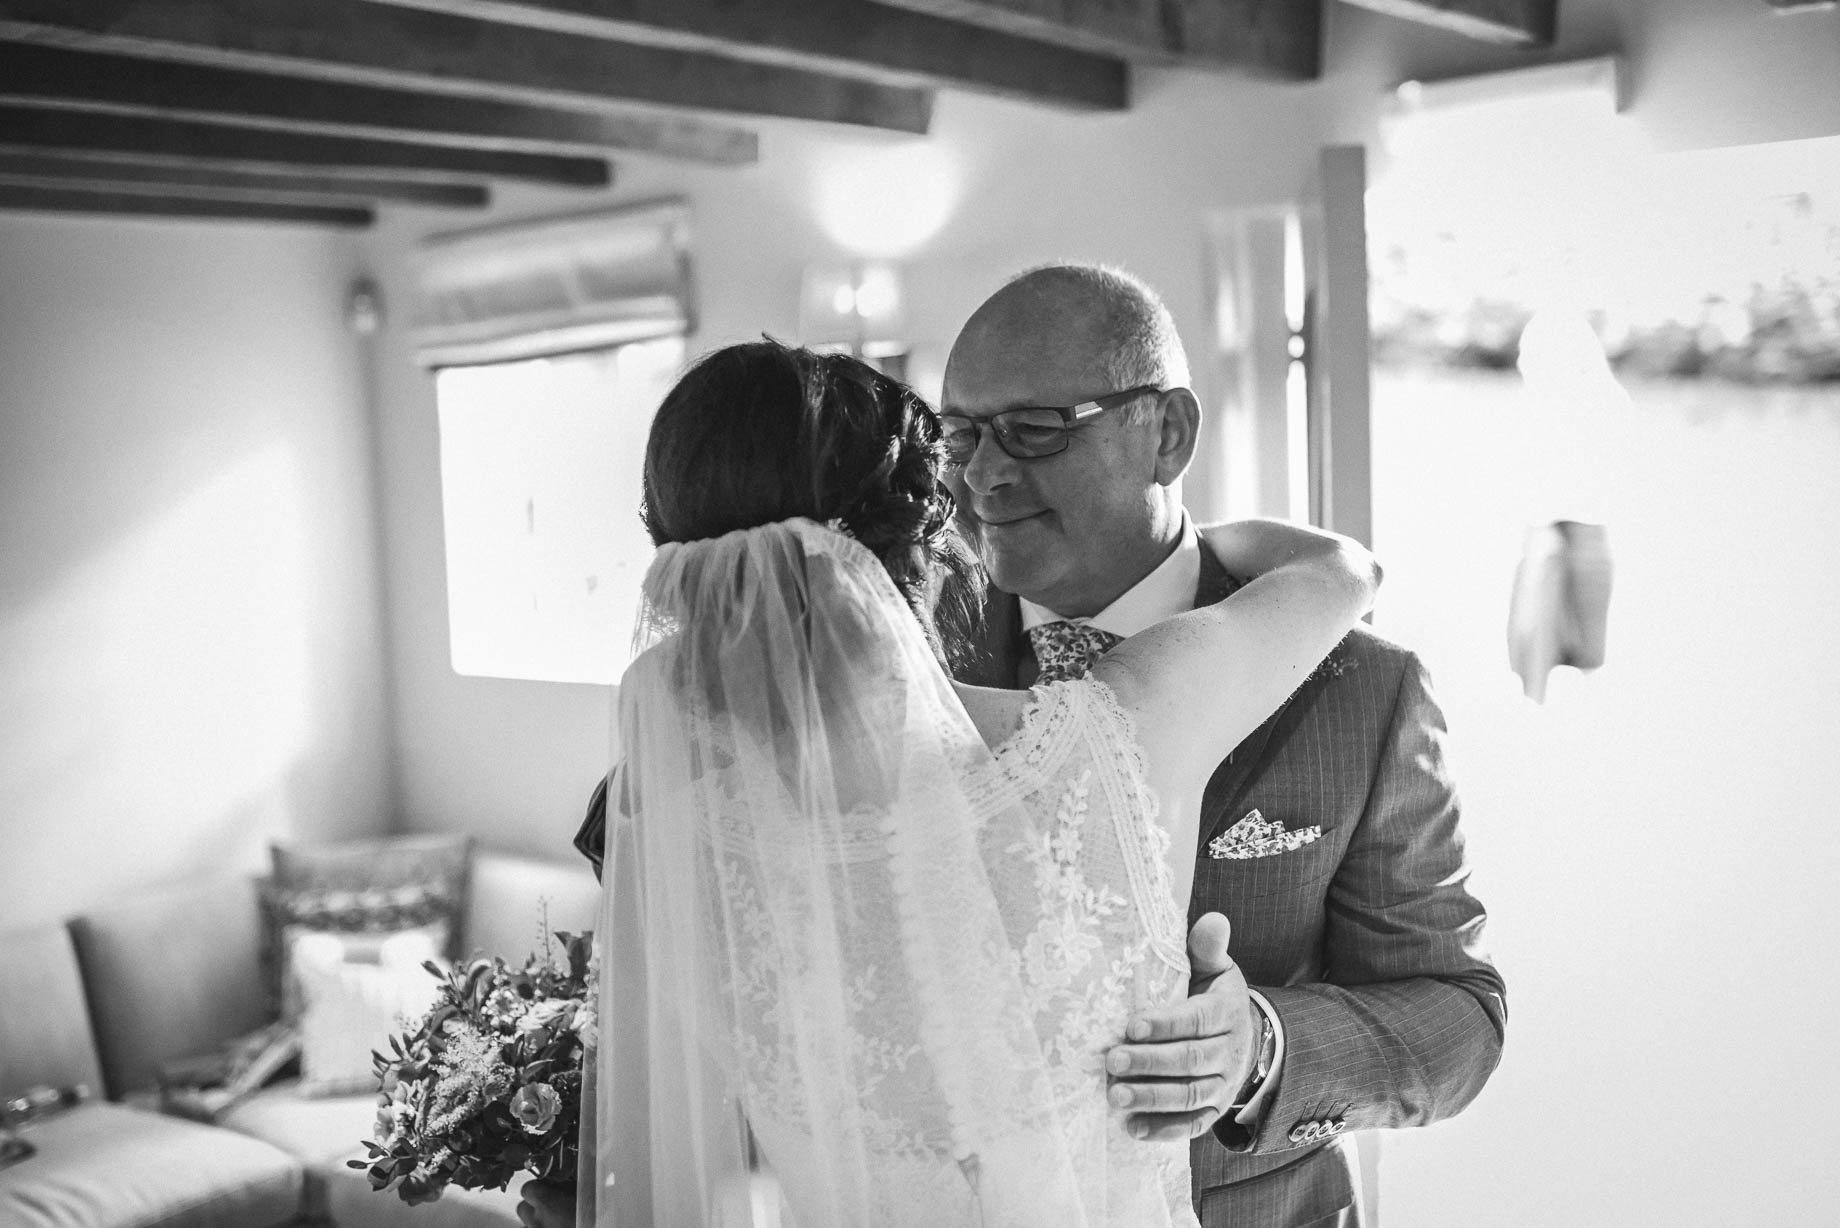 Gaynes Park wedding photography - Guy Collier Photography - Rachel and Jon (55 of 169)